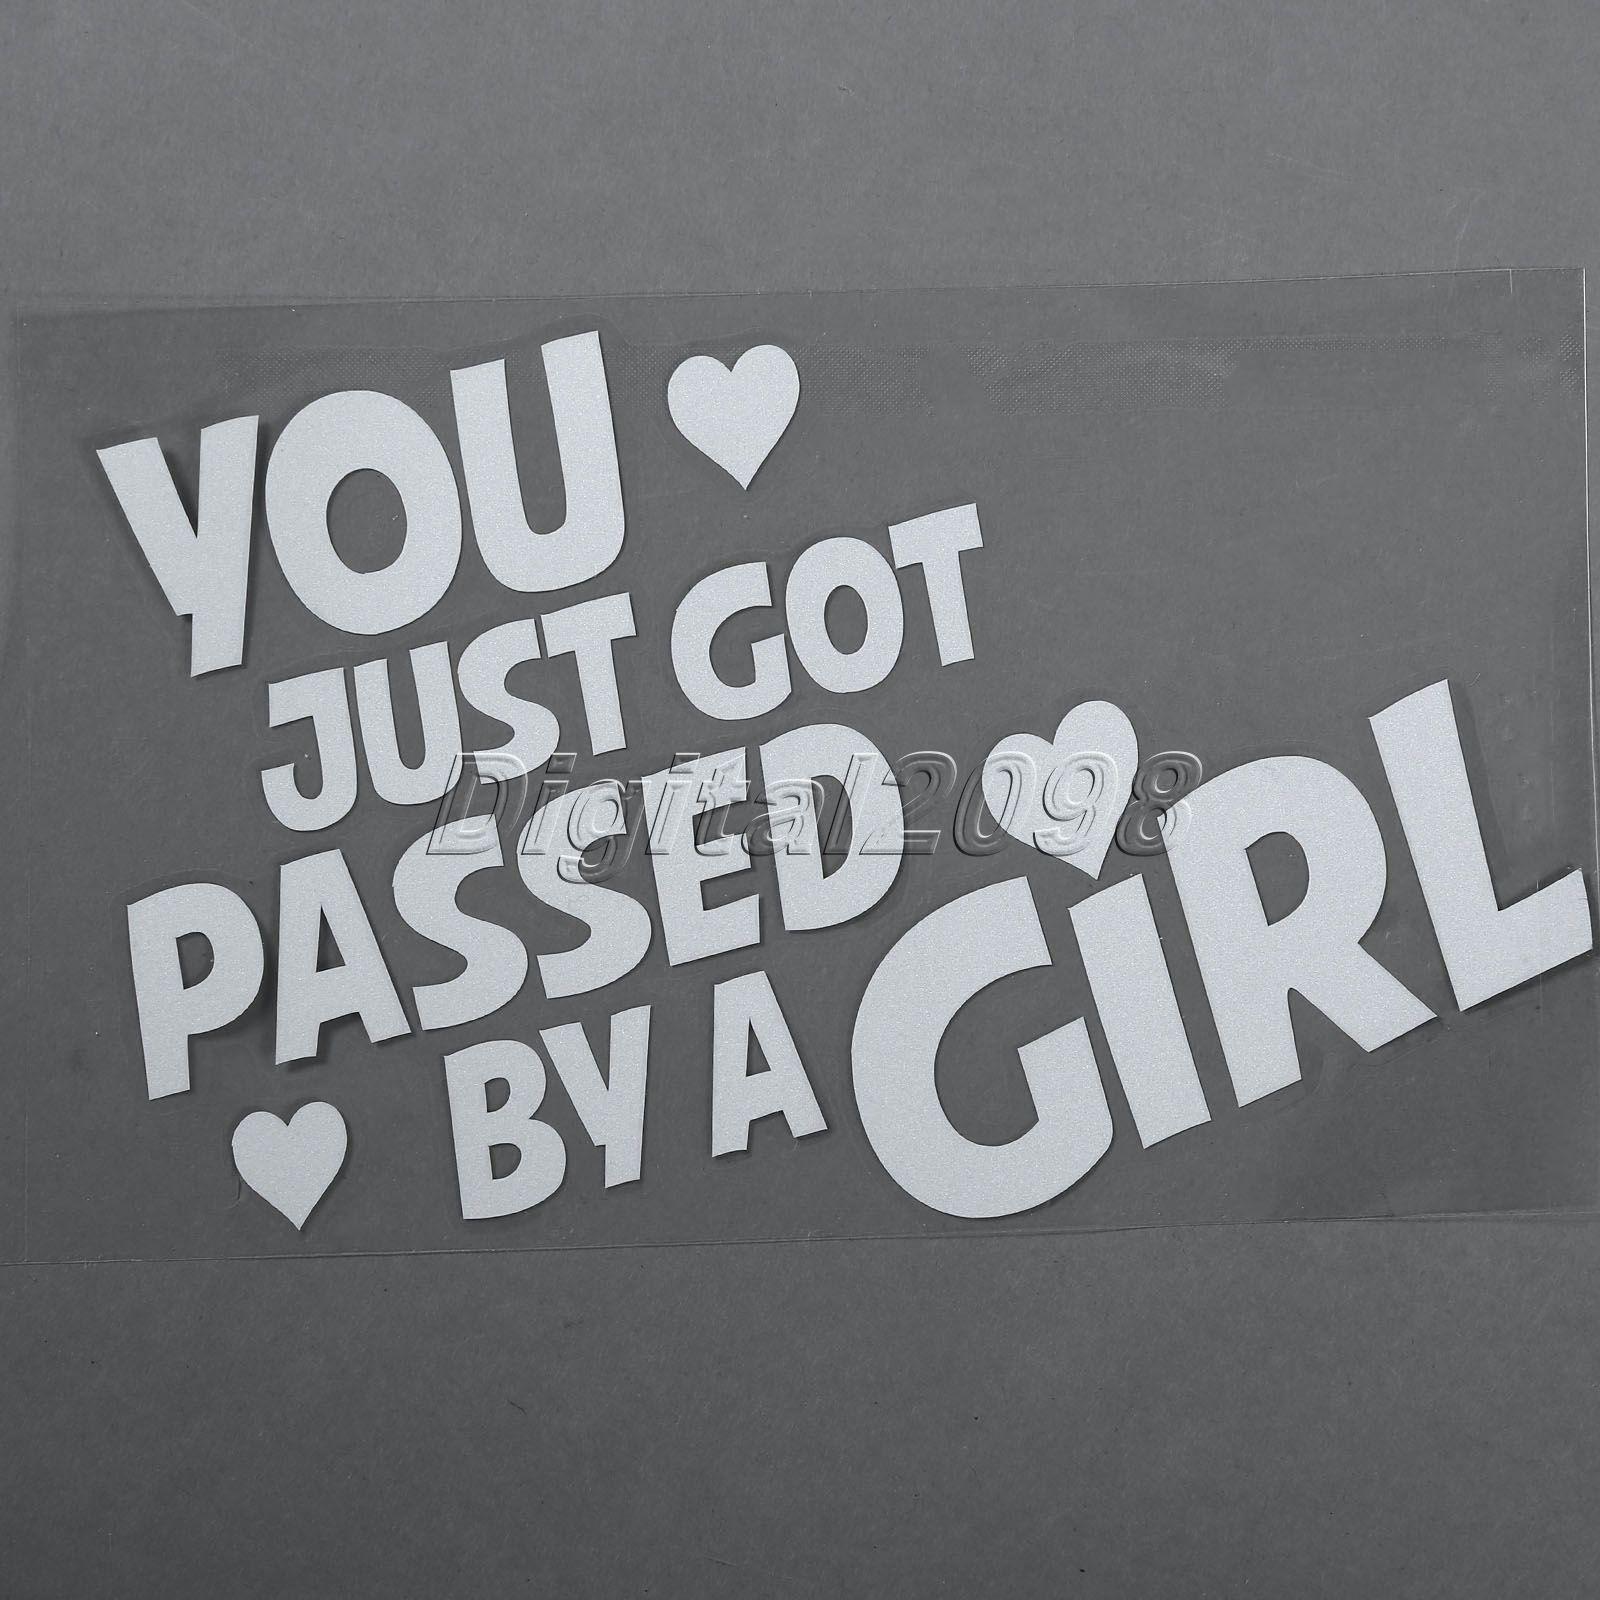 Car pass sticker design - Pumpkin You Just Got Passed By A Girl Car Sticker White Vinyl Decals On Cars Reflective